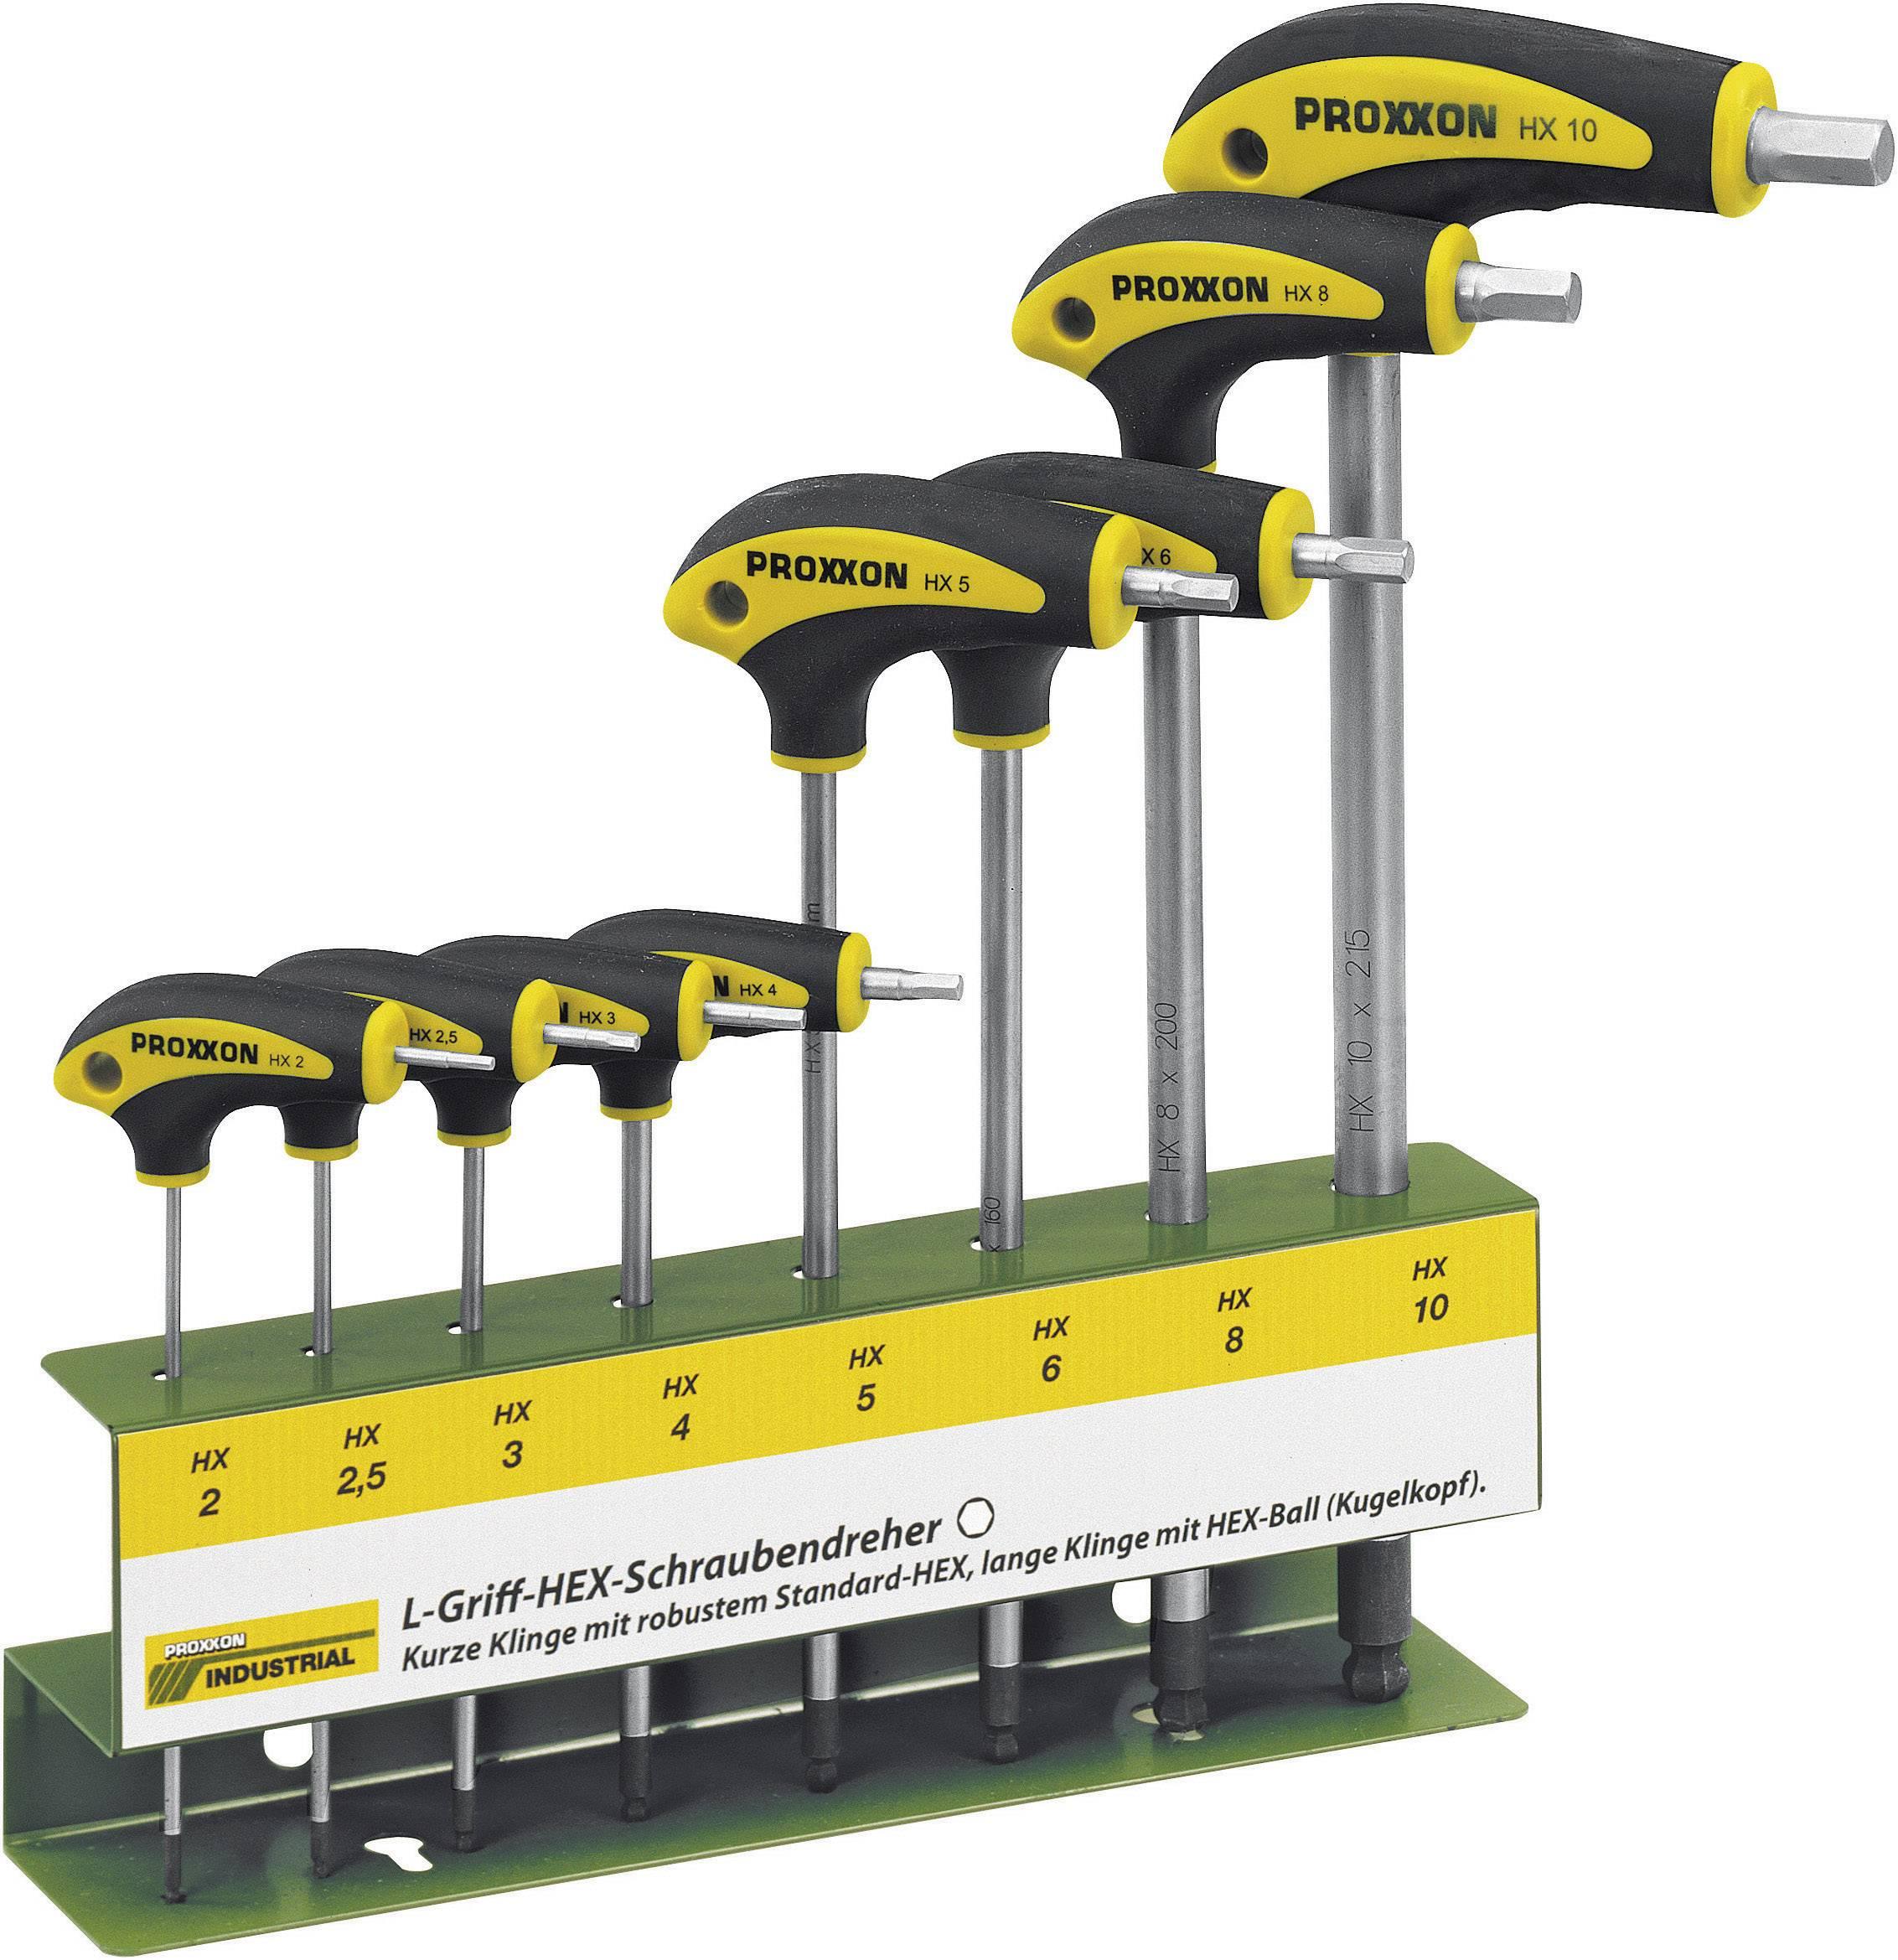 Súprava skrutkovačov Proxxon Industrial HEX L-handtag 22 650, 8-dielna